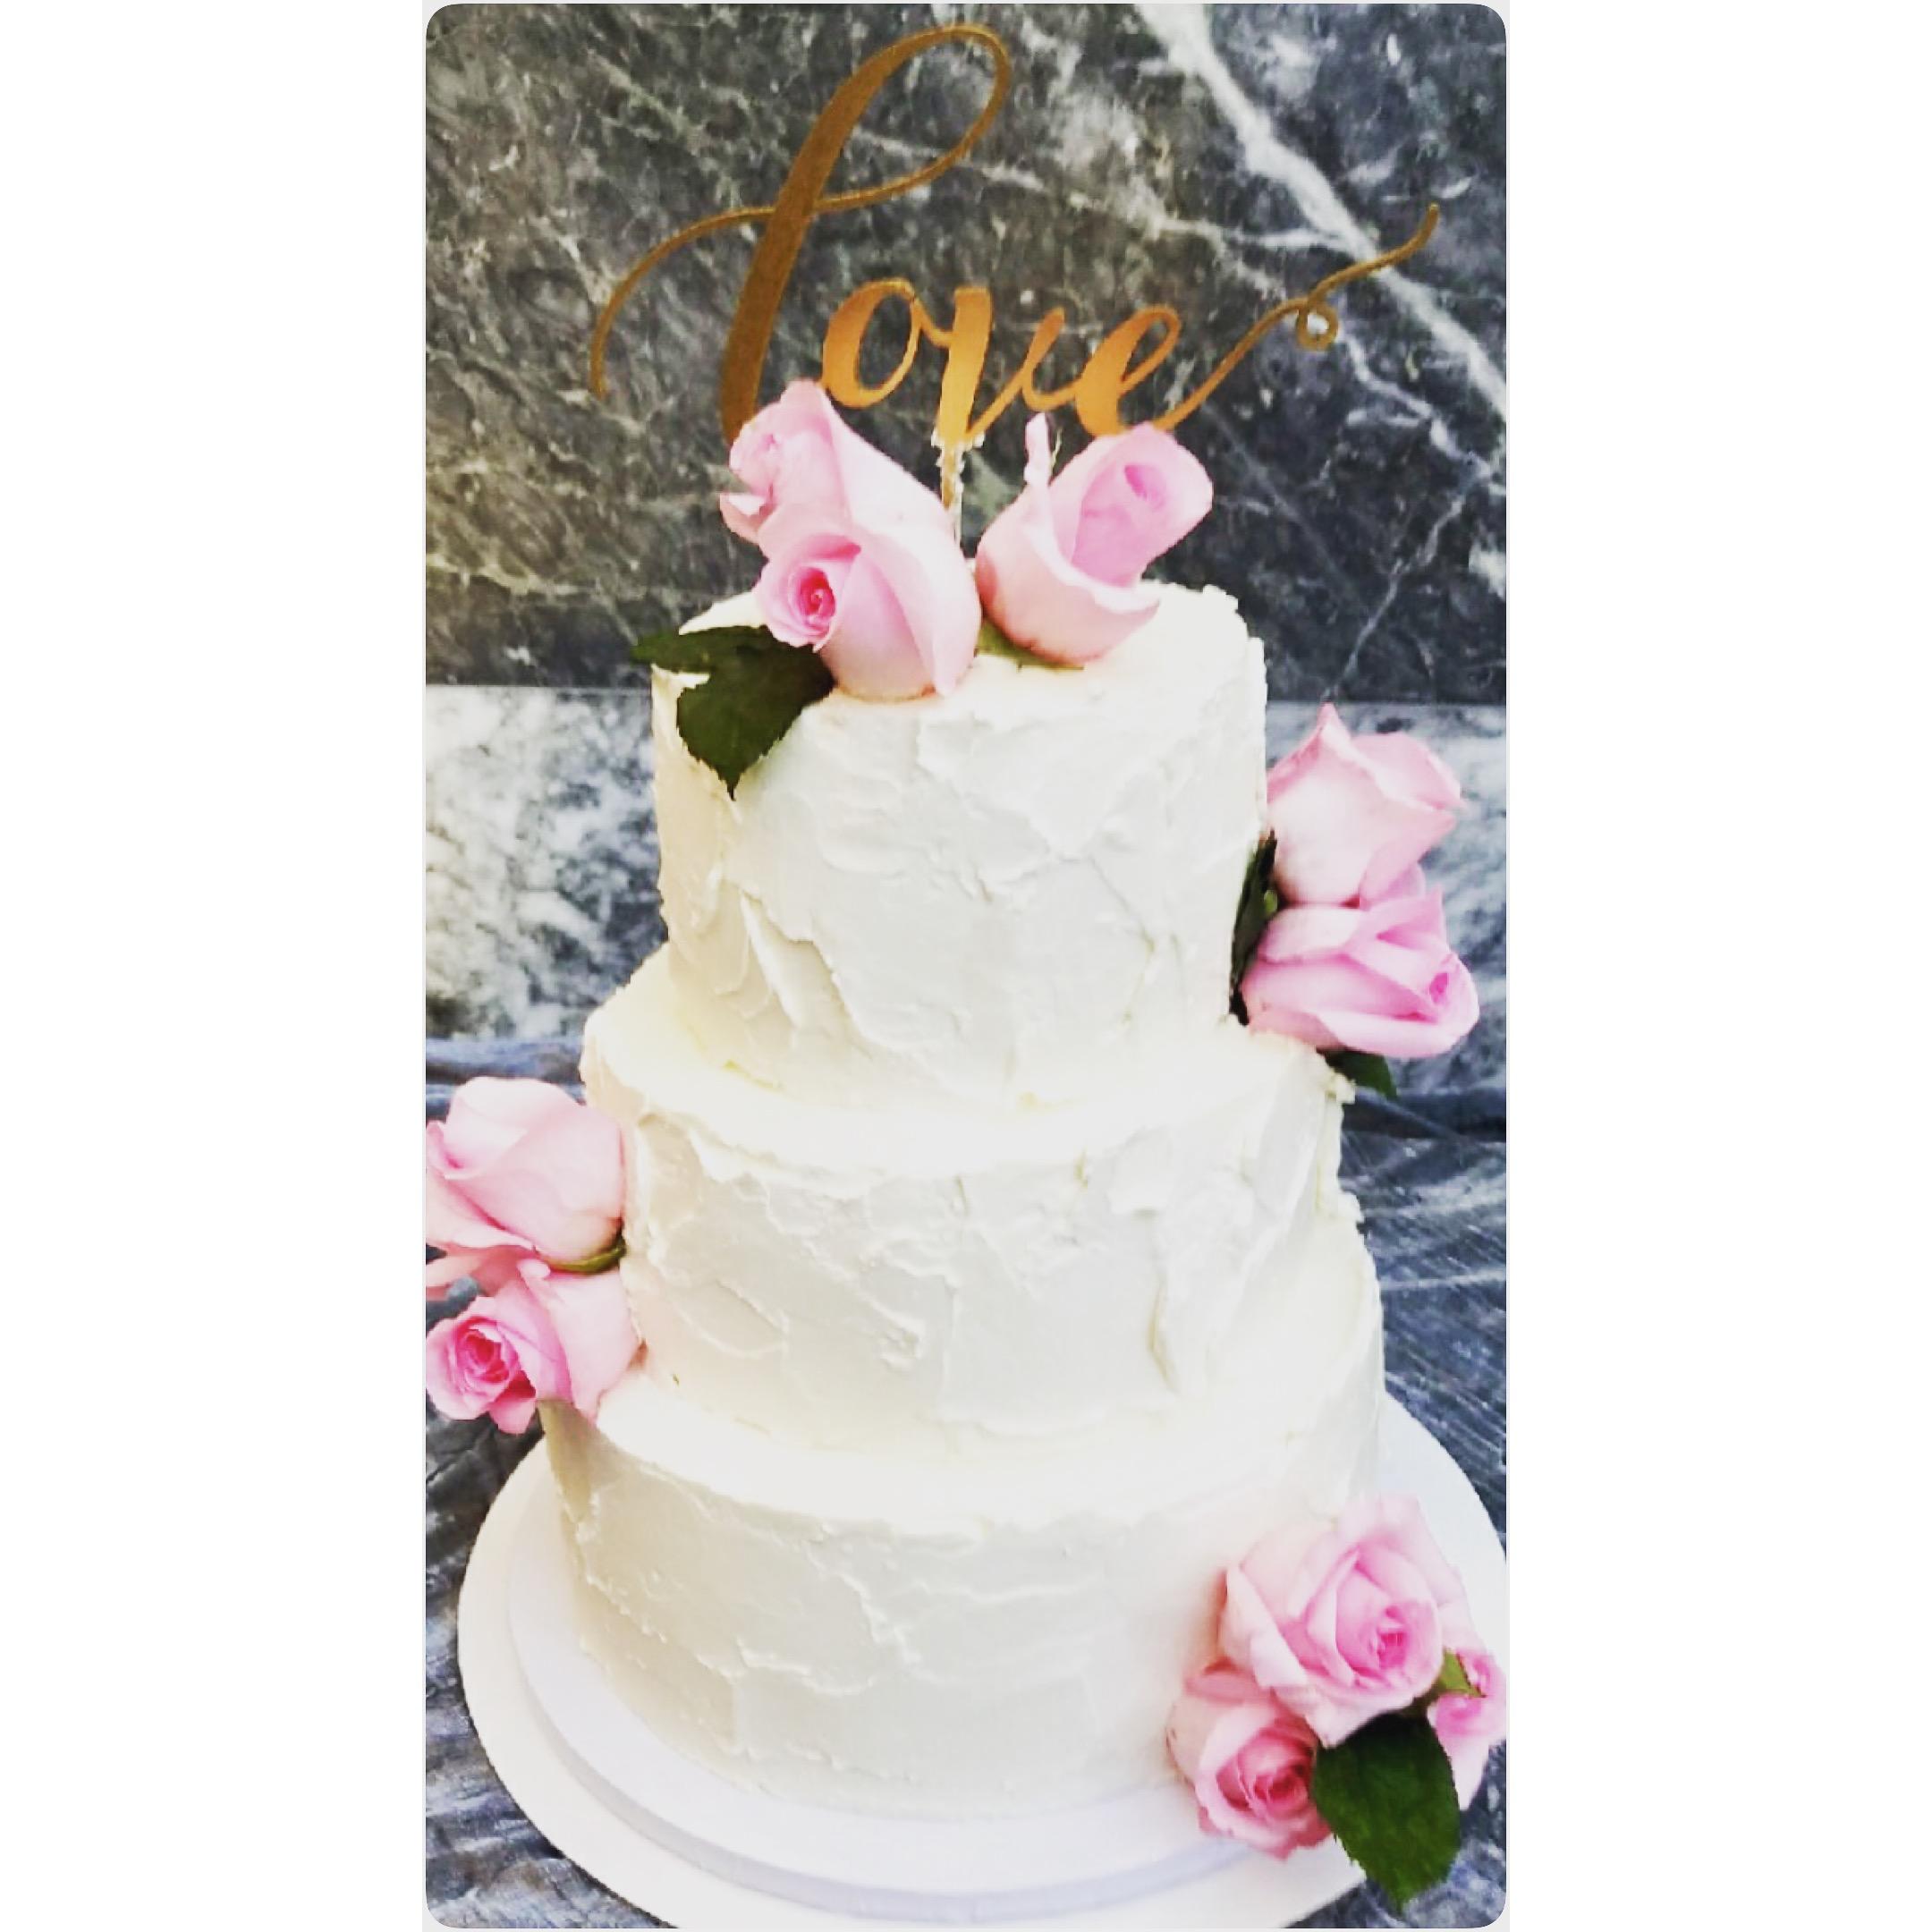 Chris and Emily's Wedding Cake